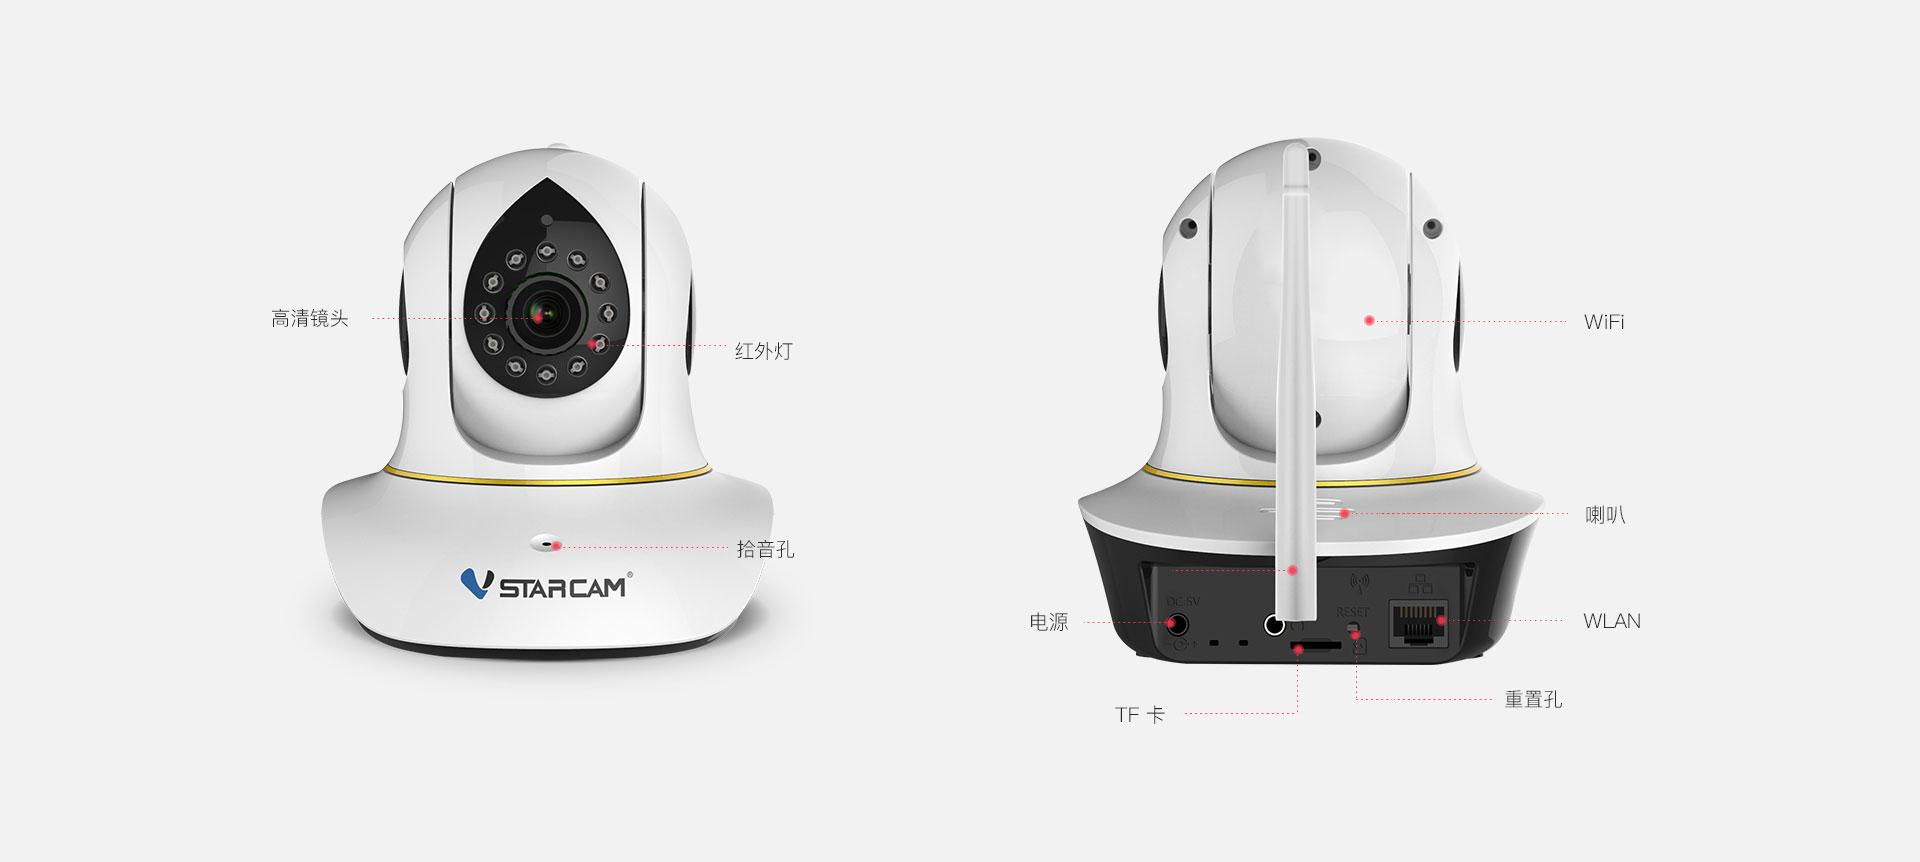 1080p高清网络摄像机